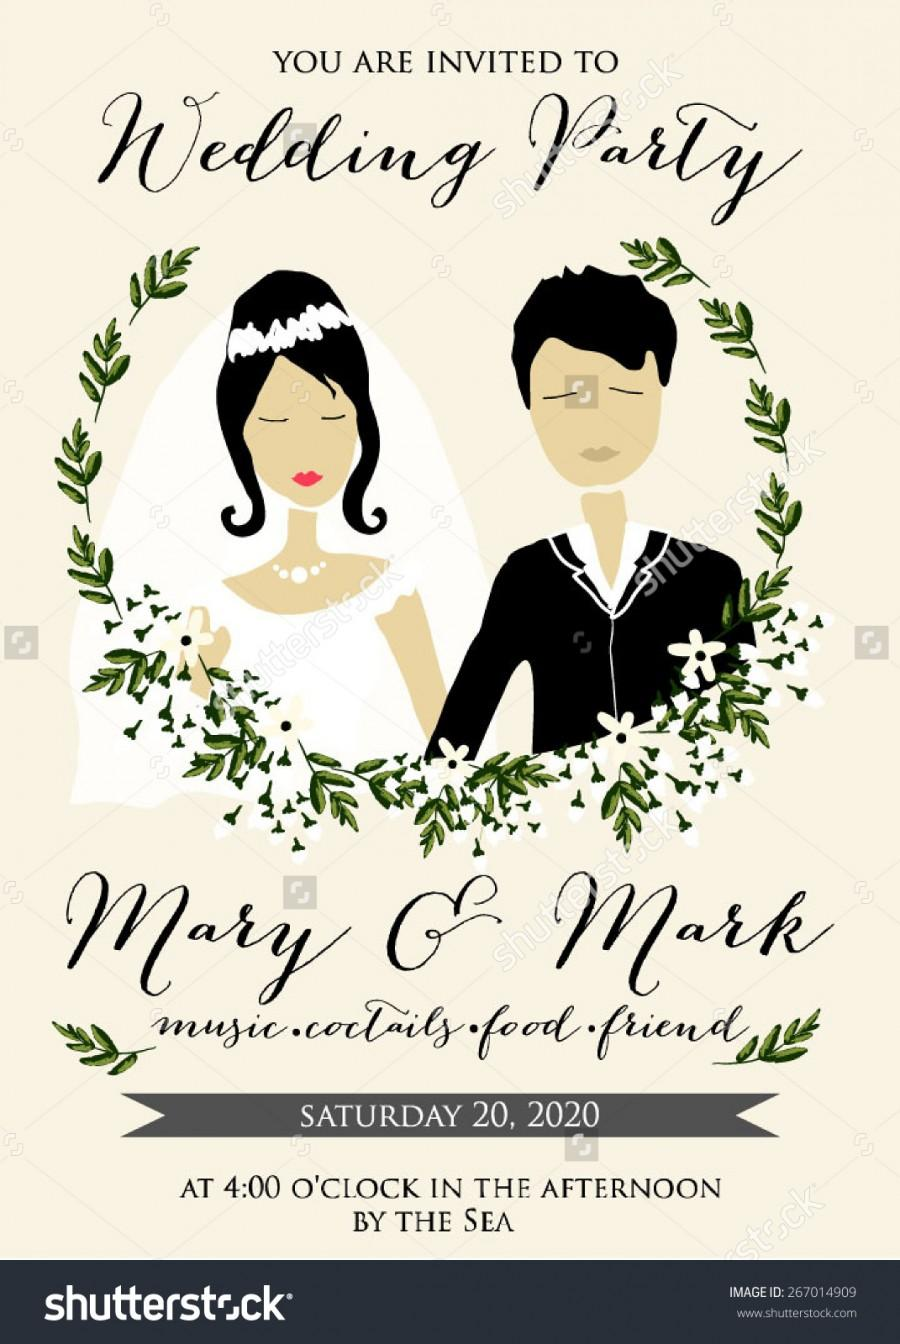 Wedding Invitation With Cartoon Groom And Bride In Retro Style